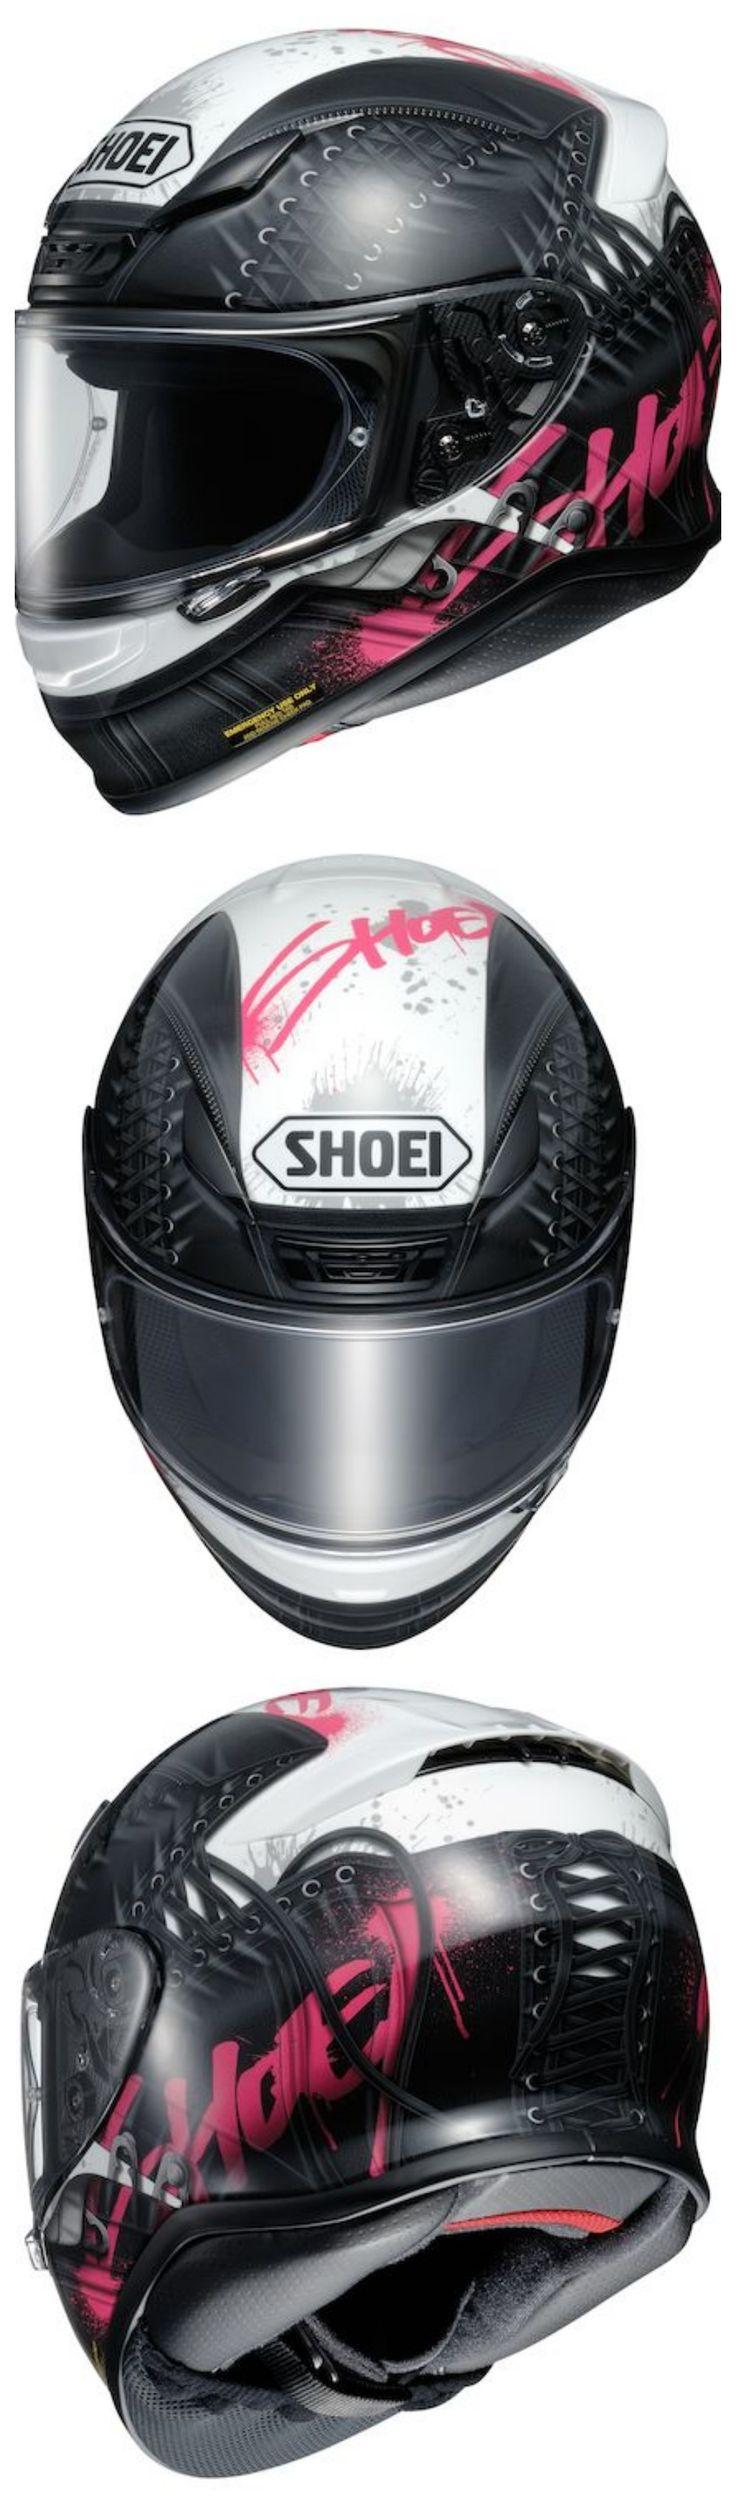 Shoei Seduction Motorcycle Helmets